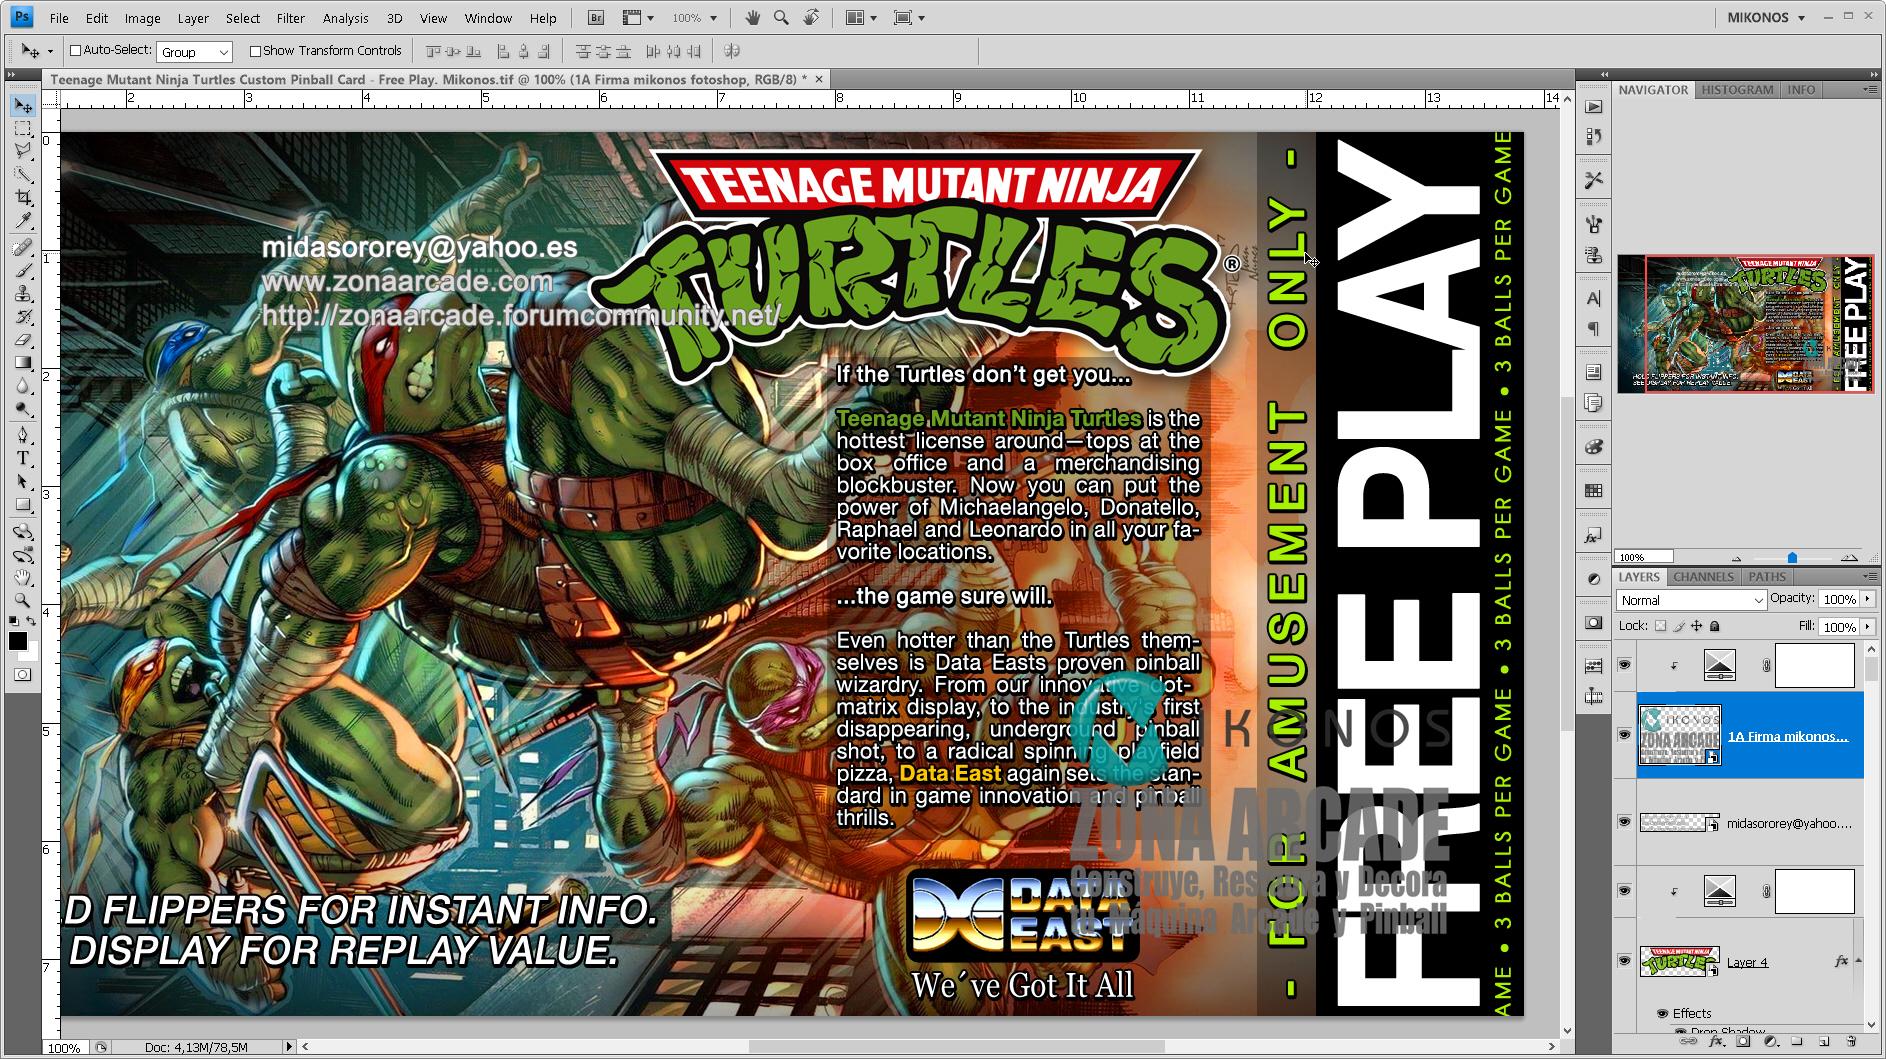 Teenage Mutant Ninja Turtles Pinball Card Customized - Free Play. Mikonos2